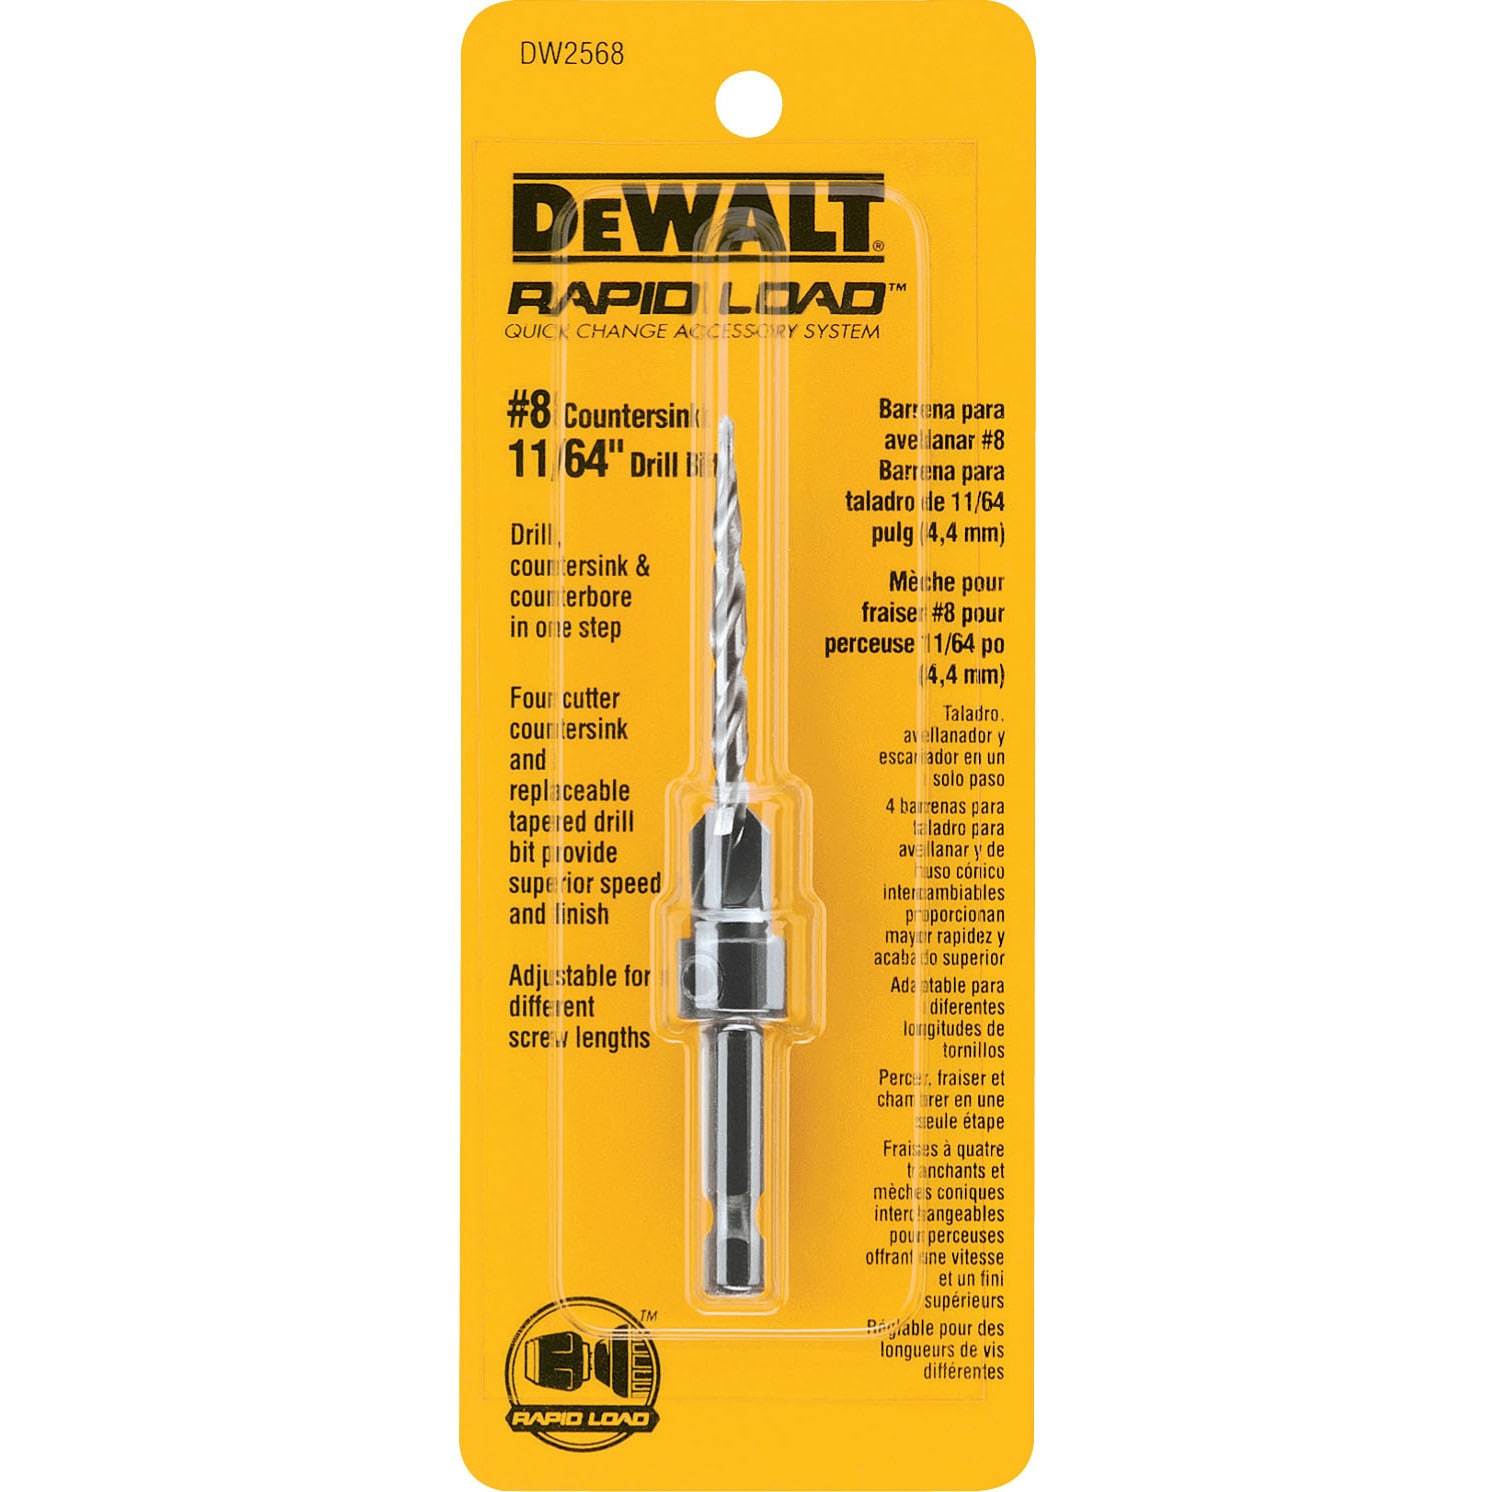 DeWALT DW2568 #8-countersink With 10.1674-inch Drill Bit ...